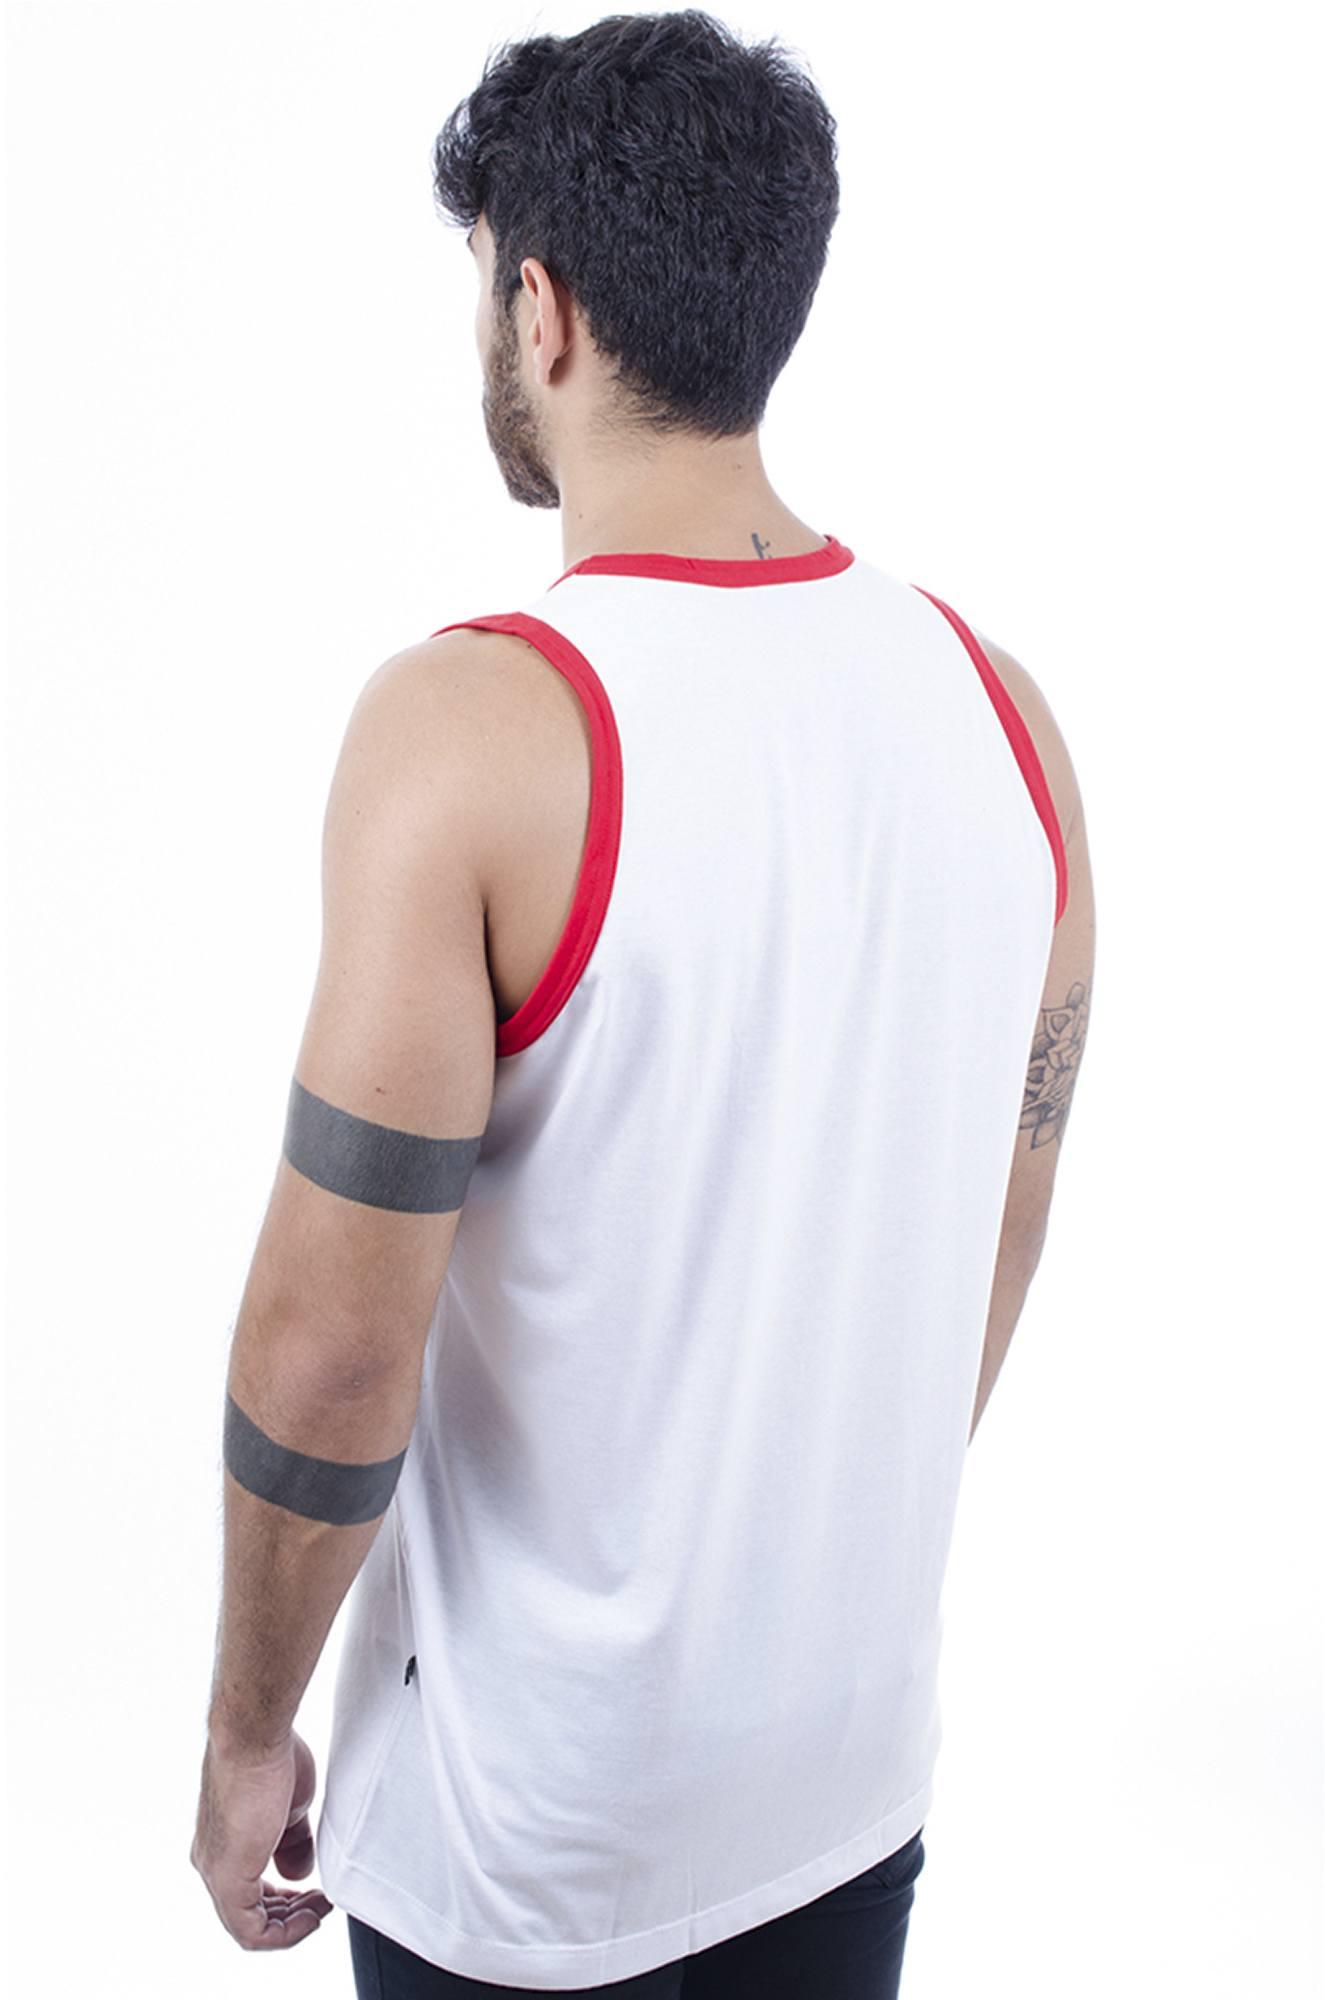 b6157a5f76 Camiseta Regata Masculina Hardivision Vegas Branco